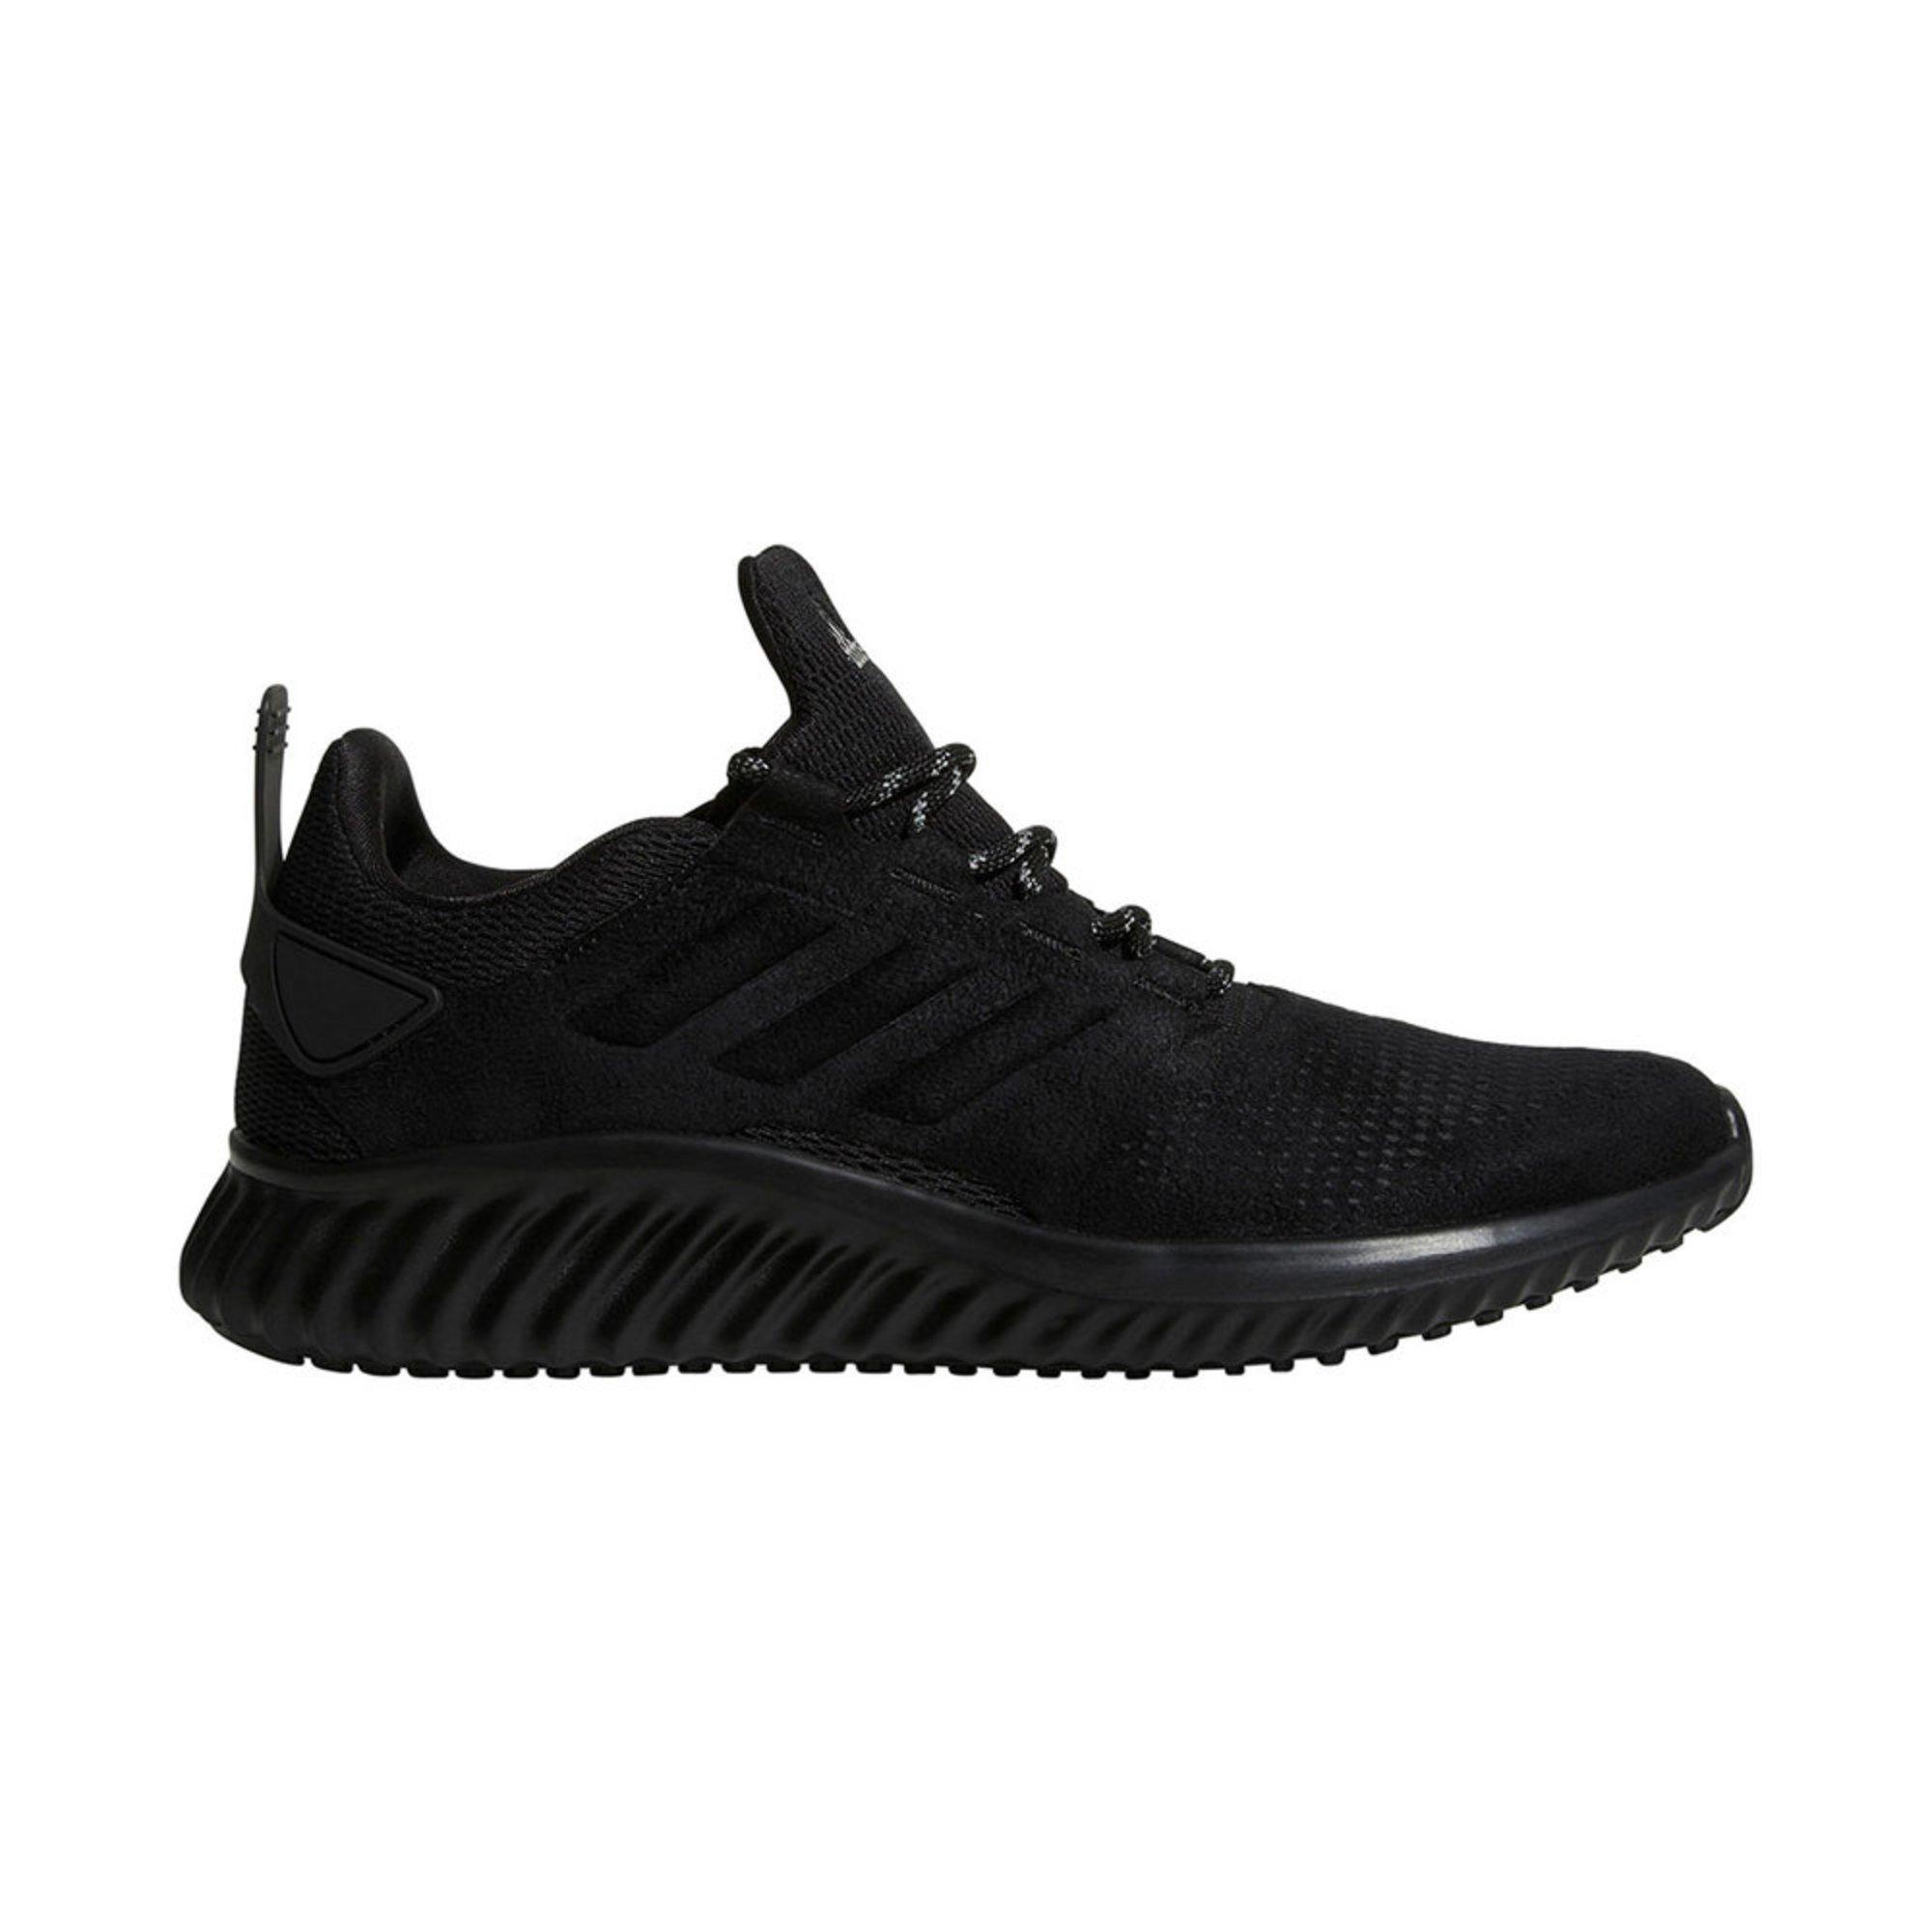 best loved 91e0f 13171 Adidas Men s Alphabounce Crm Running Shoe   Men s Running Shoes ...